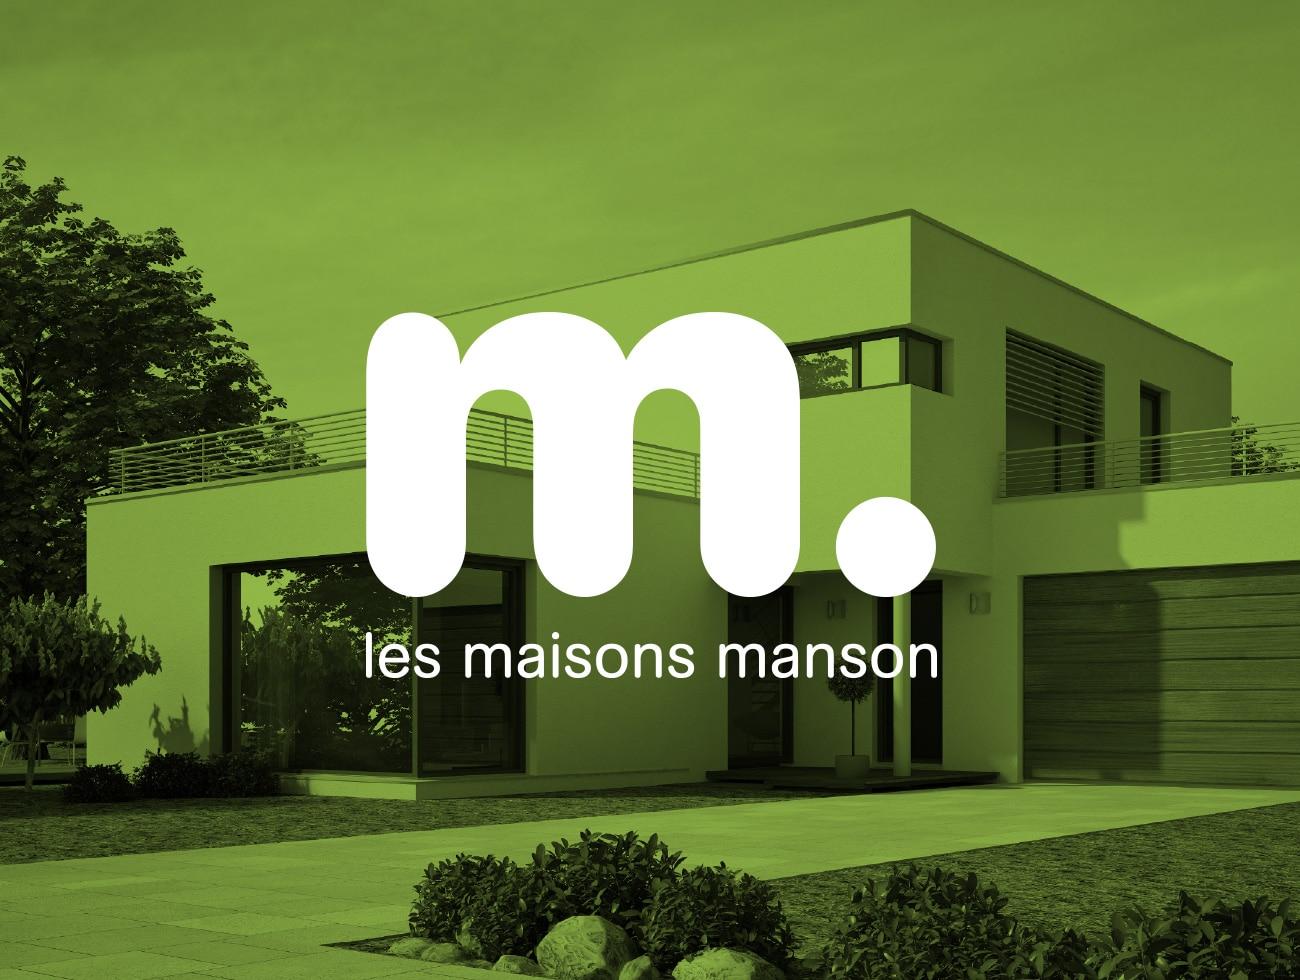 maisons-manson-logo-identite-visuelle-territoire-marque-marketing-communication-bretagne-agence-smac